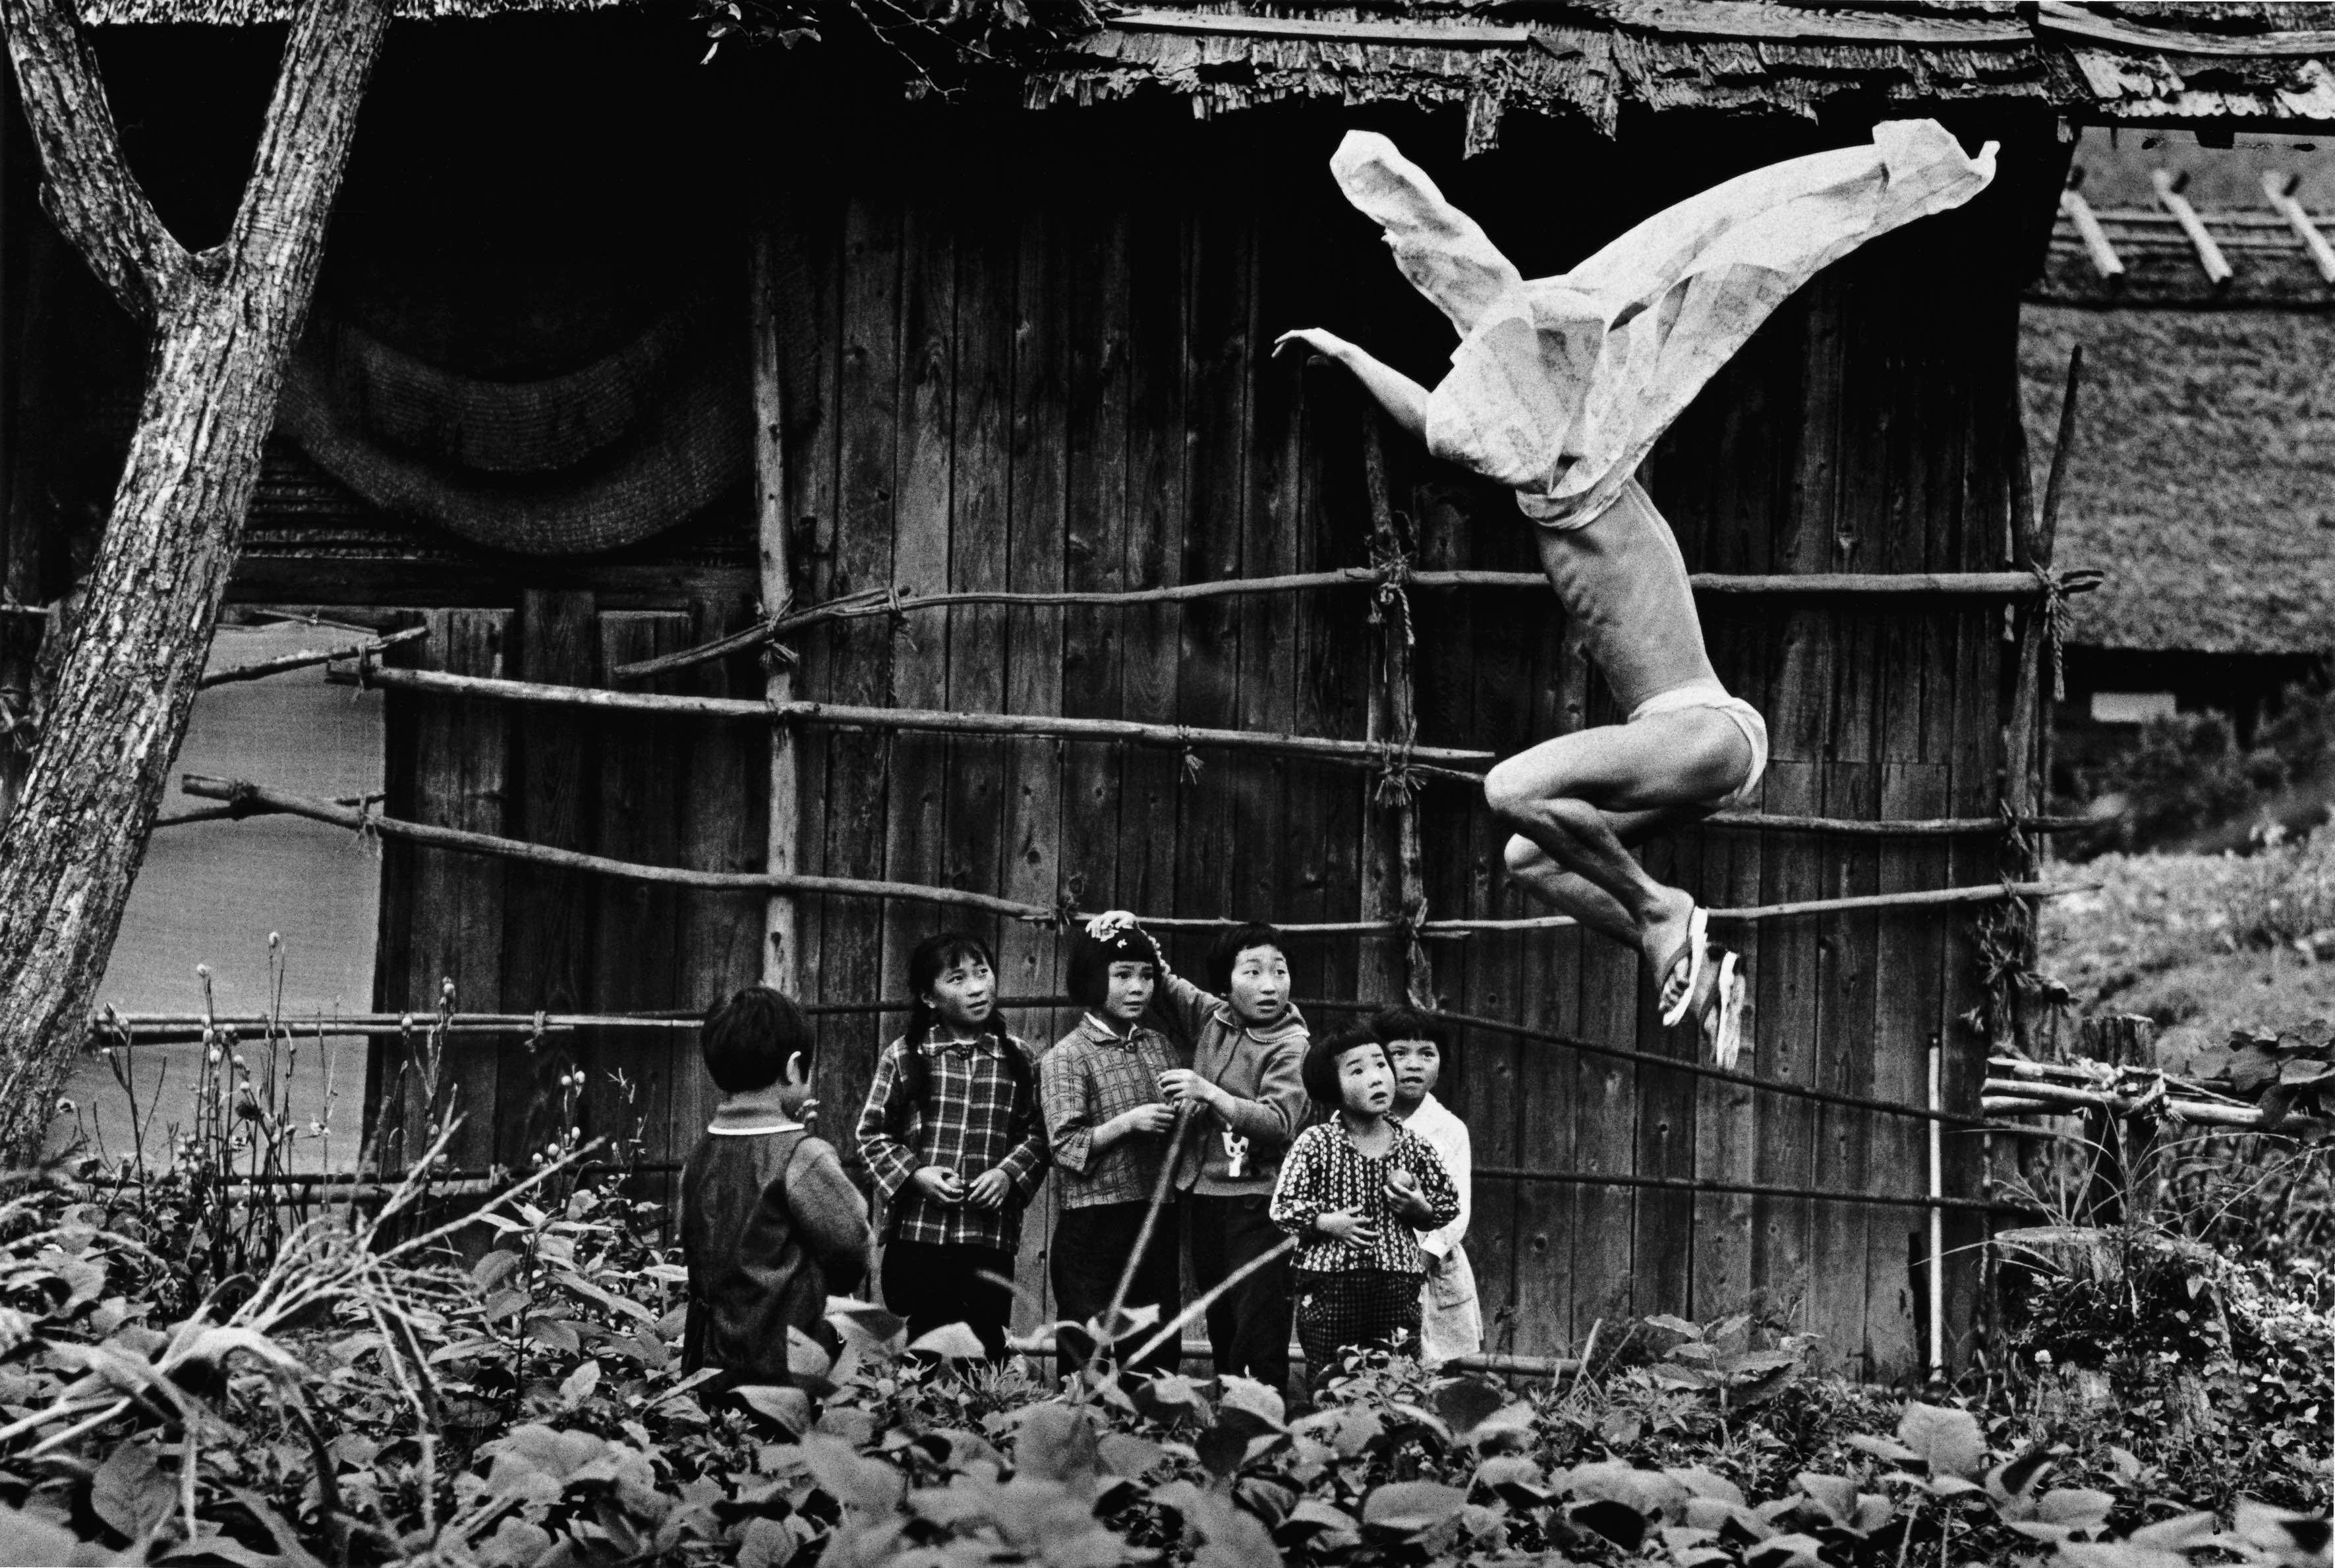 Eikoh-Hosoe-Kamaitachi-17-1965-Copyright